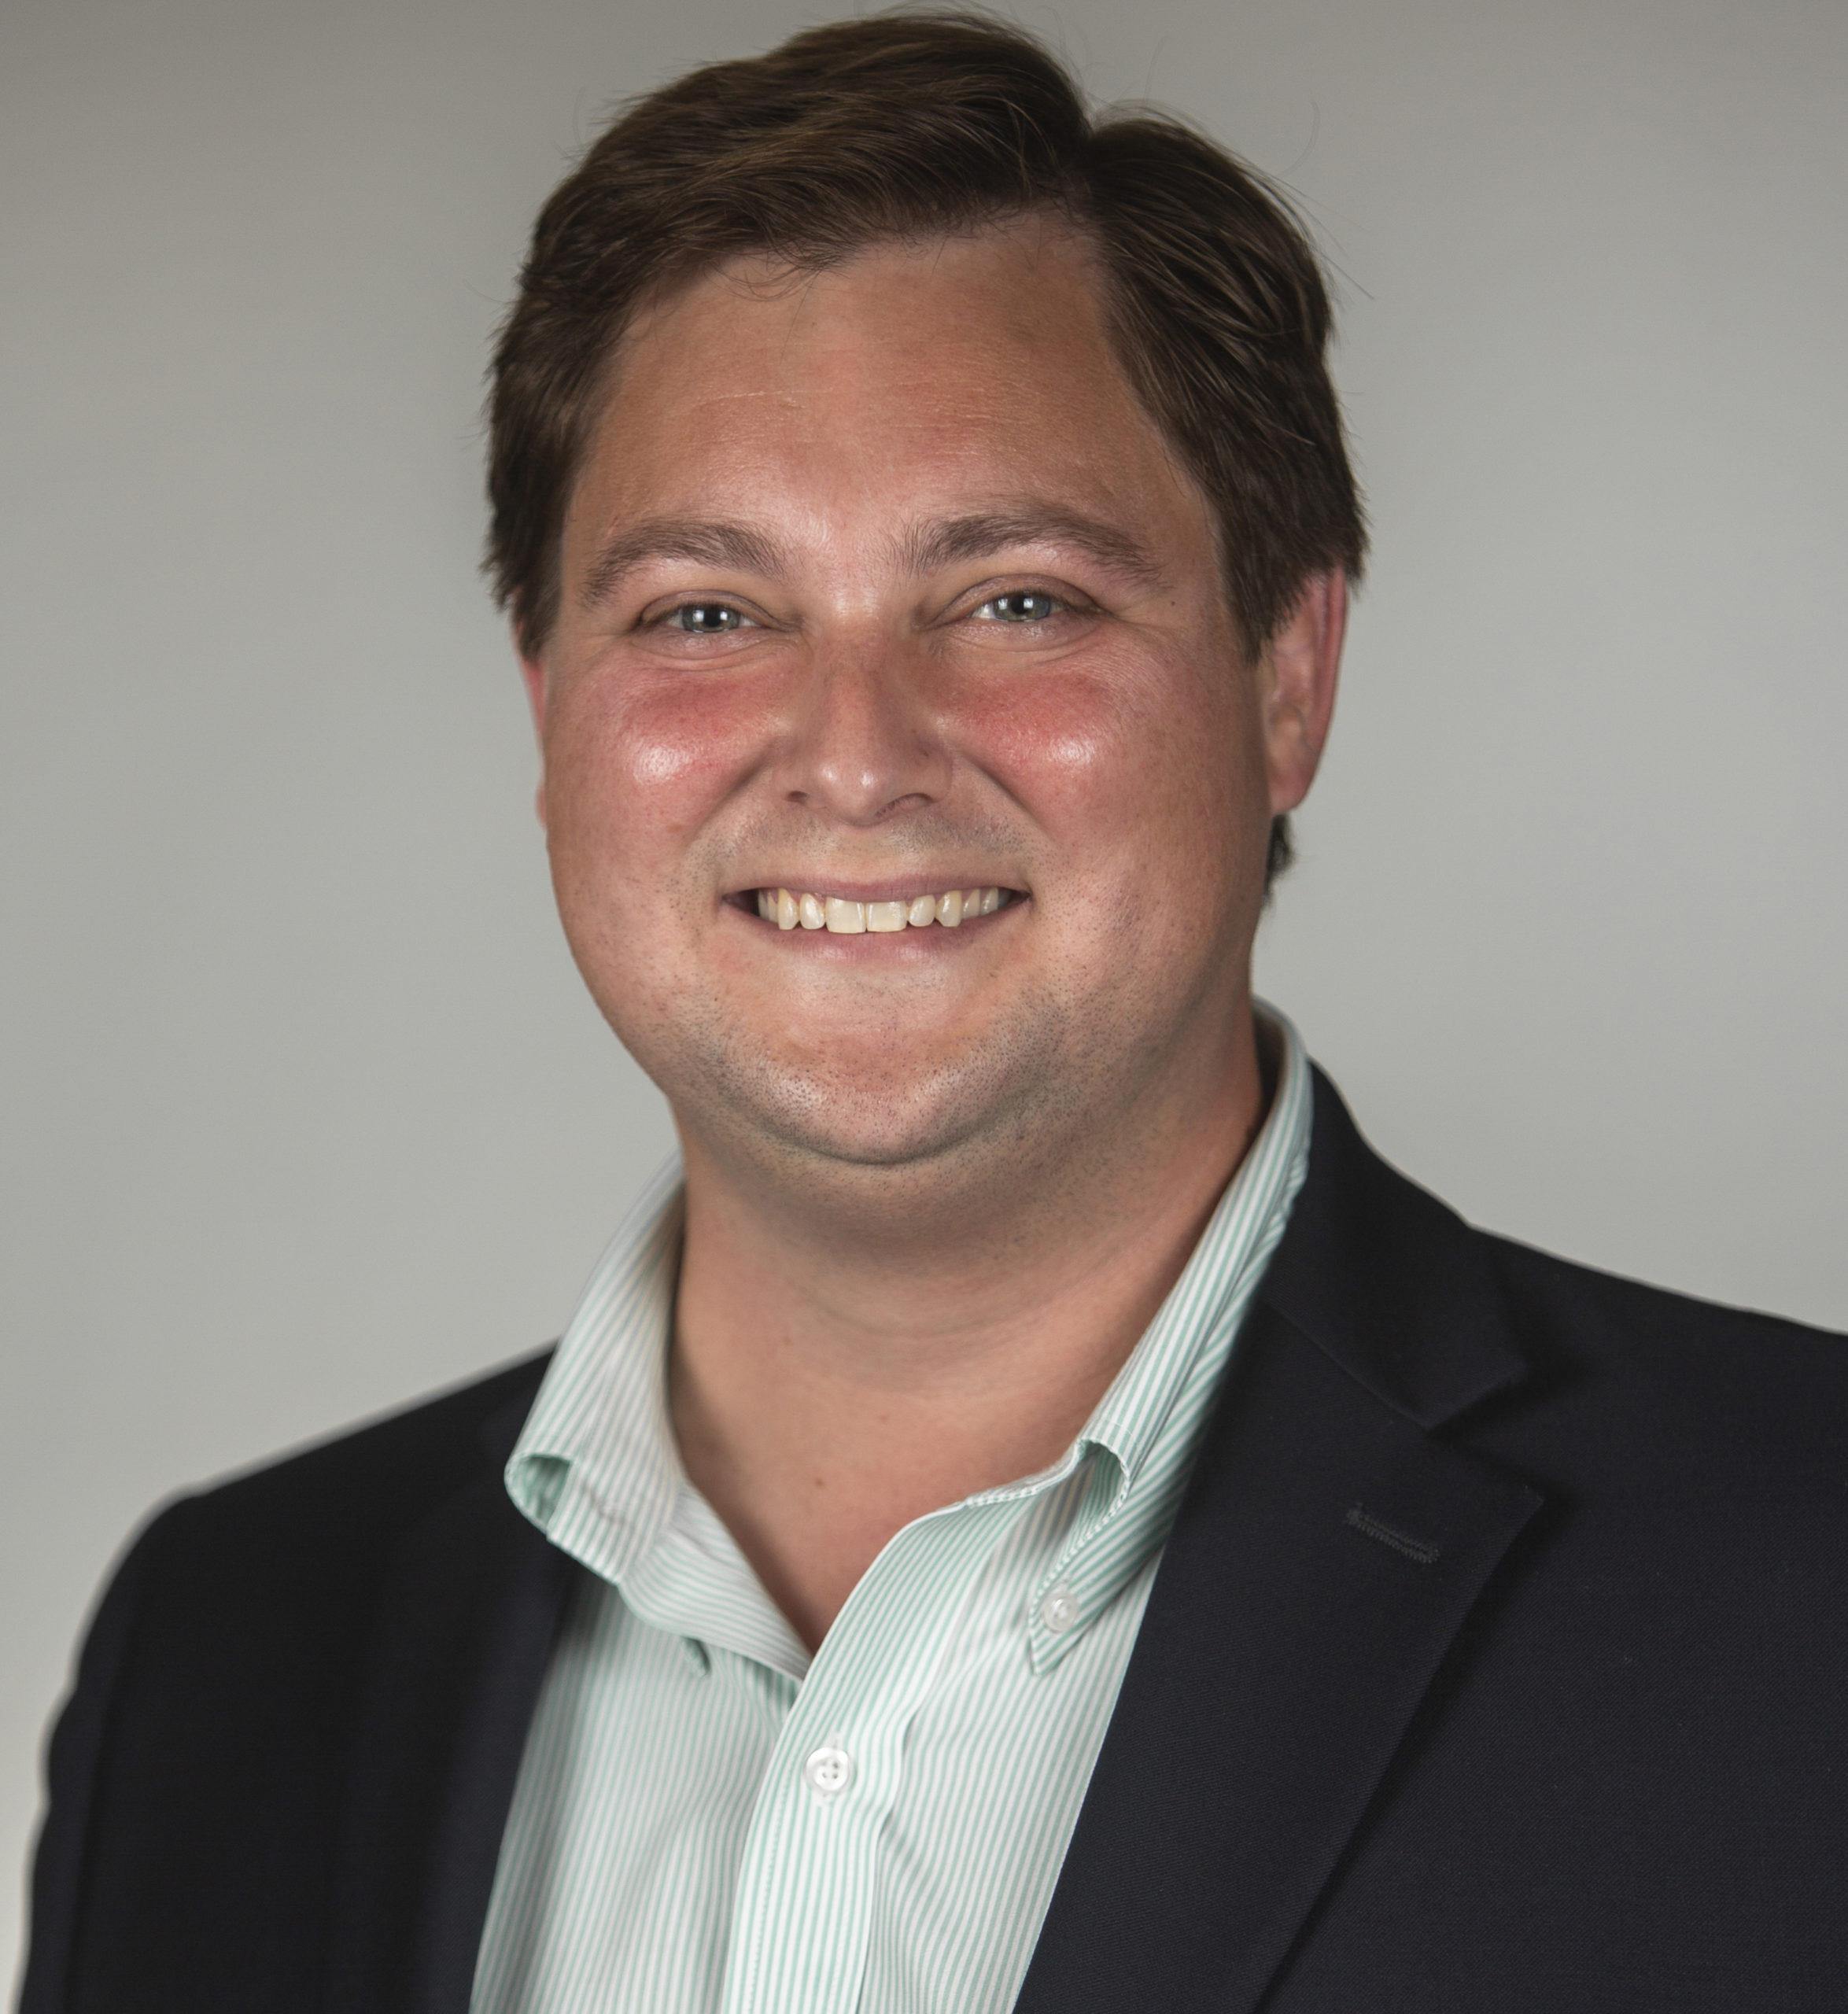 Professional headshot of Glenn Person